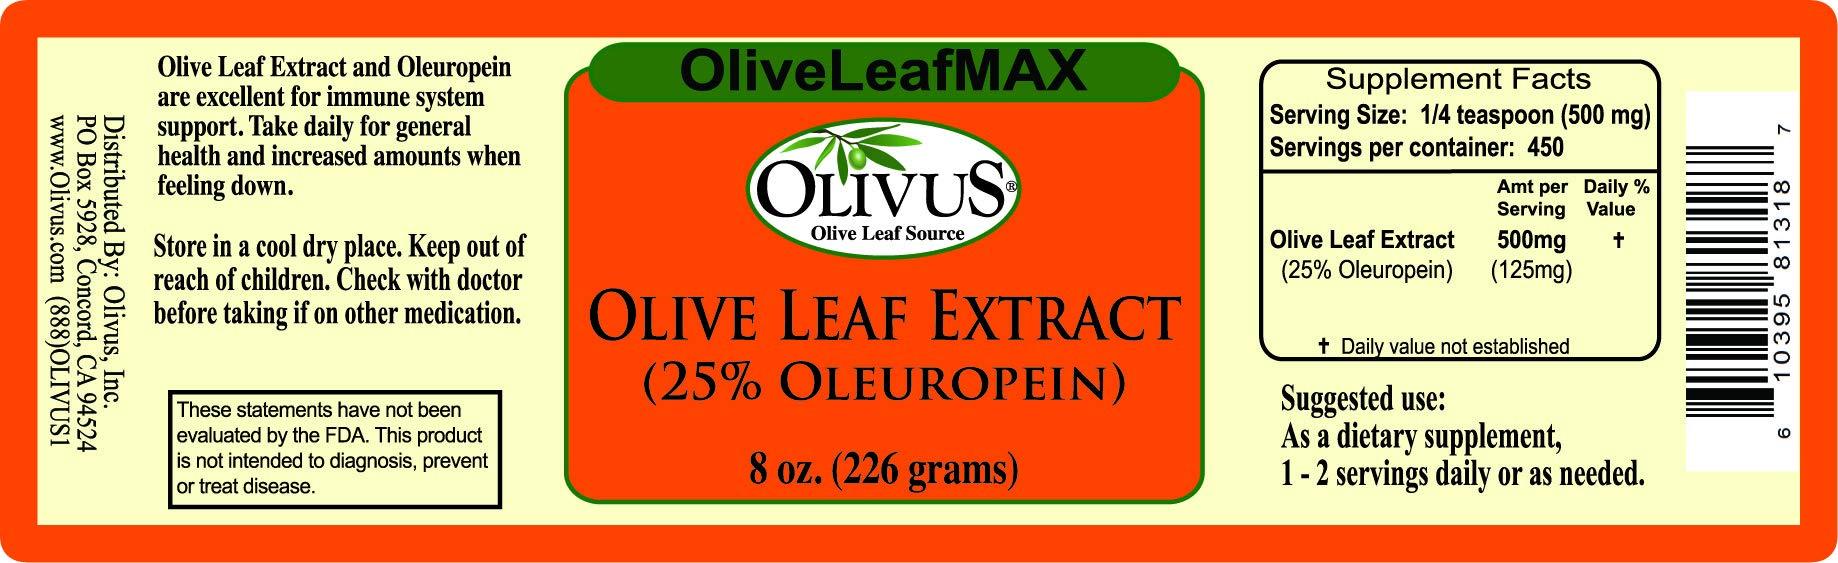 OliveLeafMAX (25% Oleuropein) Olive Leaf Extract - Bulk Powder (Unencapsulated) - 8 Ounce Jar